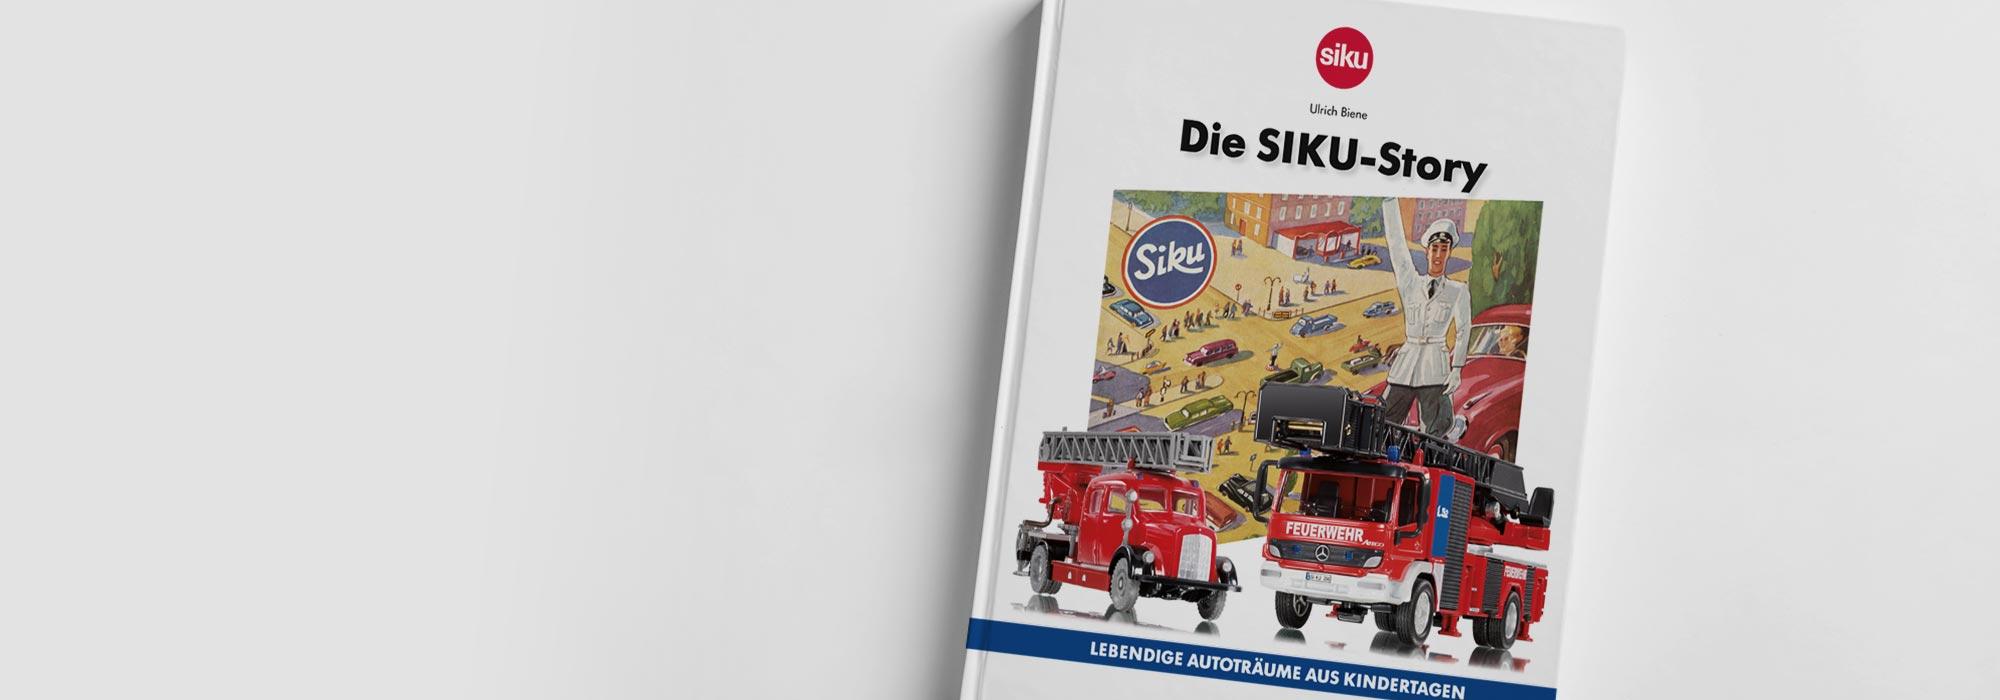 SIKU Buch